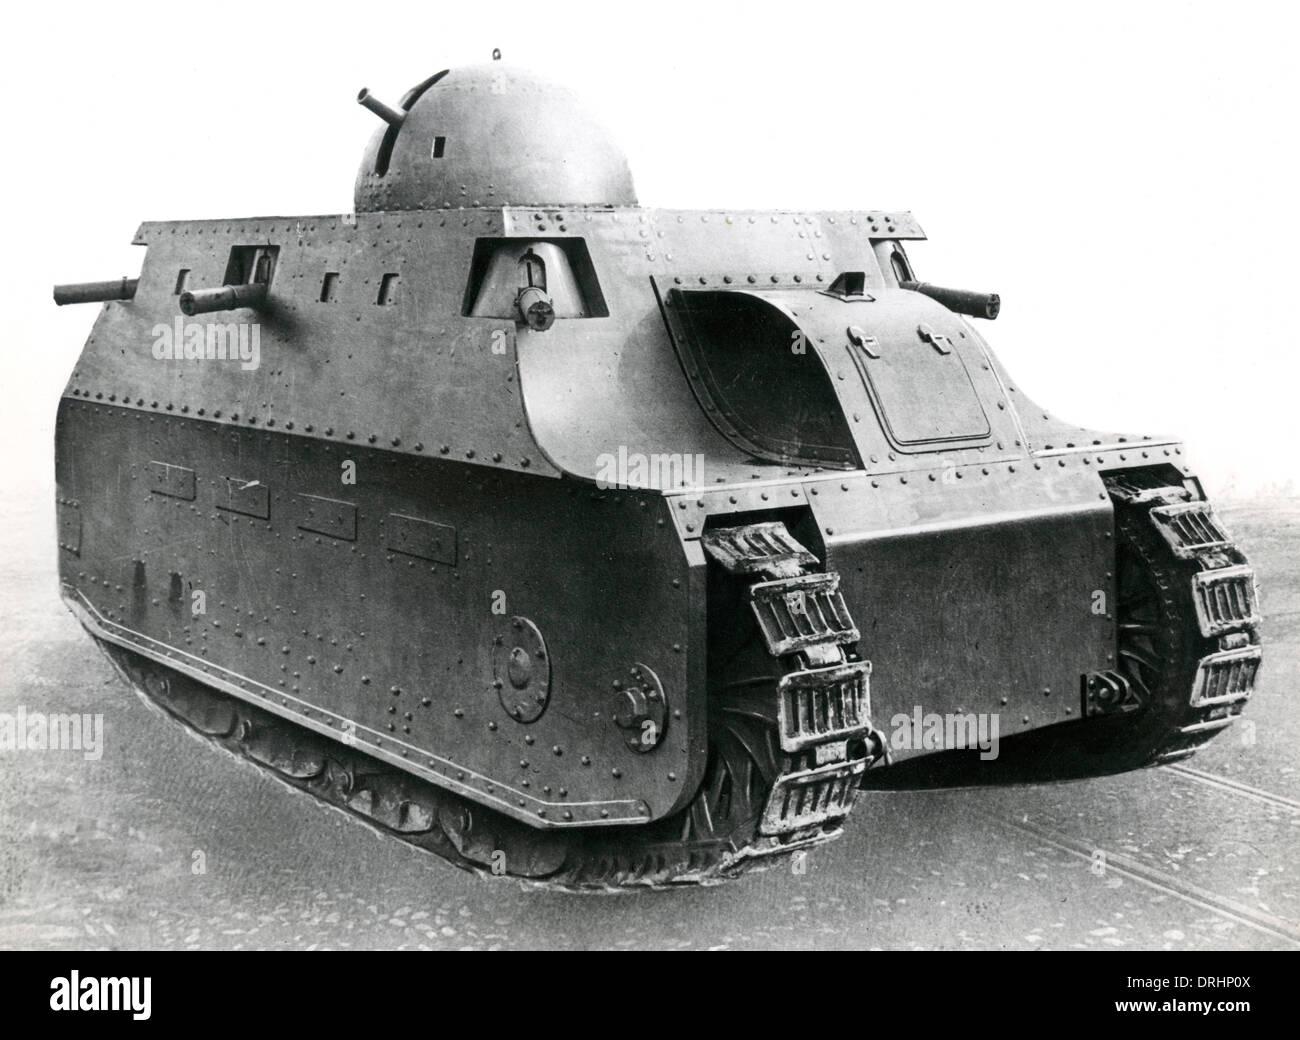 Fiat 2000 Italian heavy tank, WW1 - Stock Image